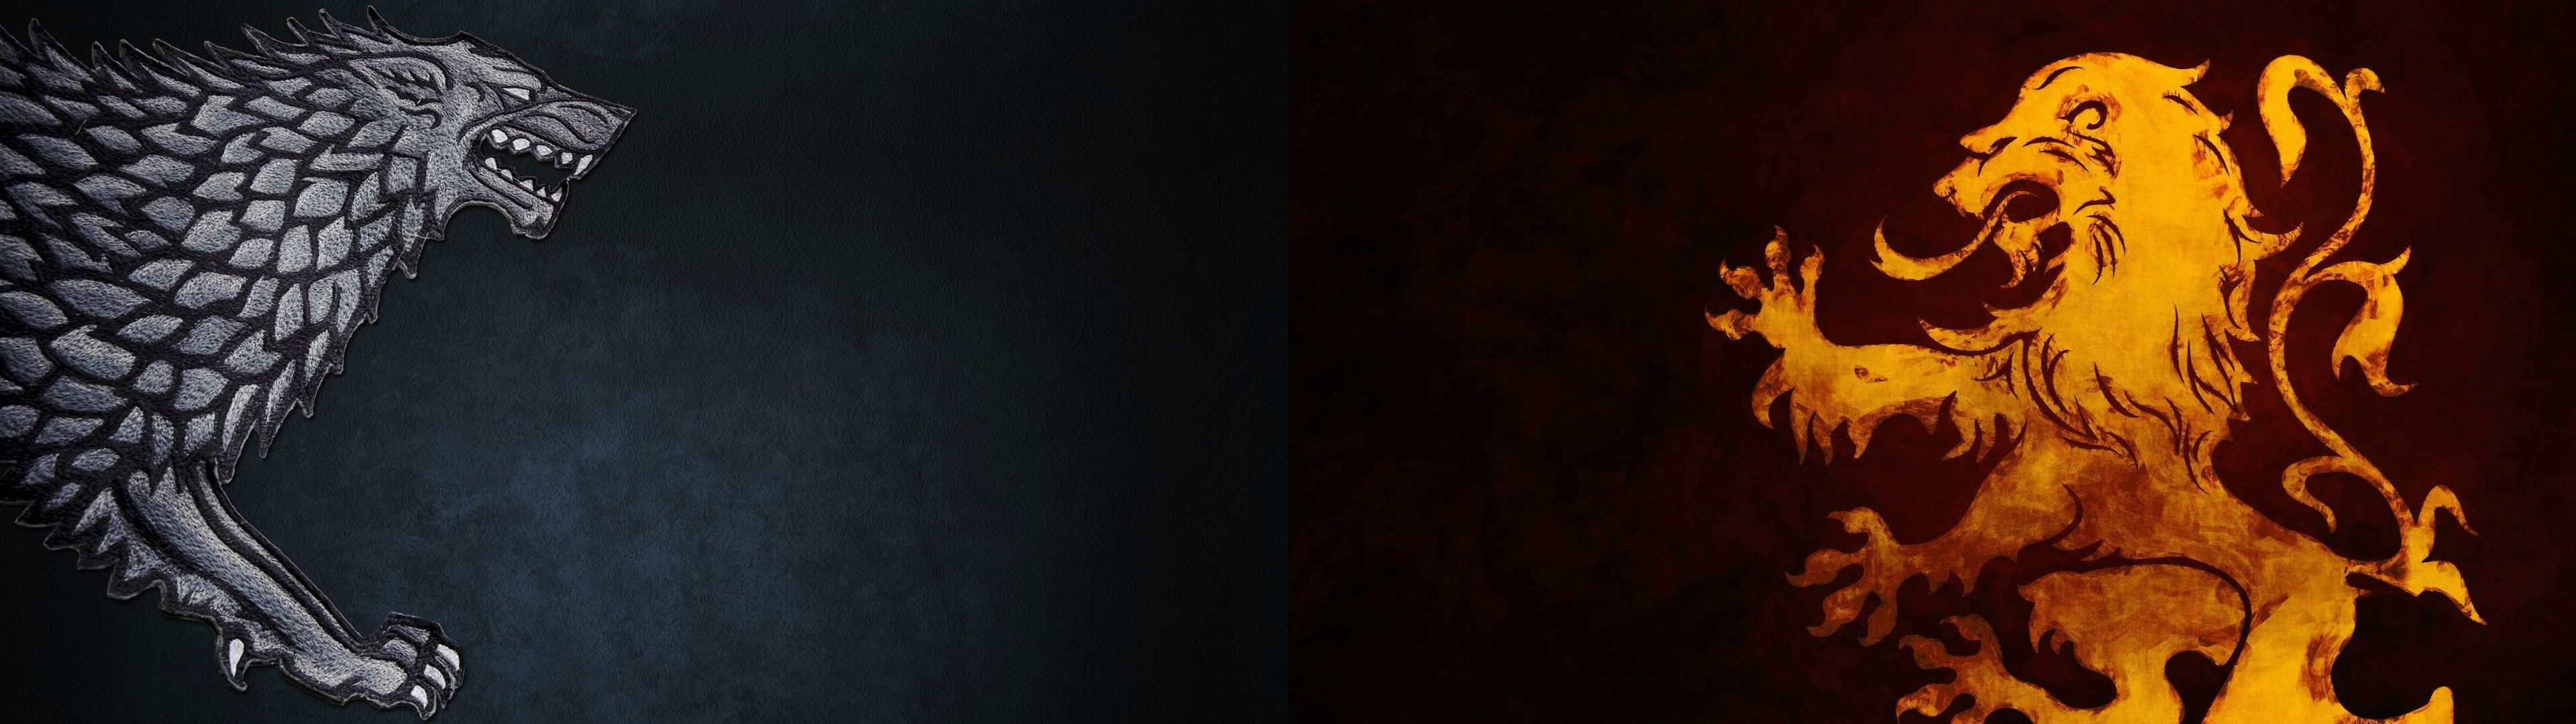 Lannister Lion Dual Screen Wallpaper